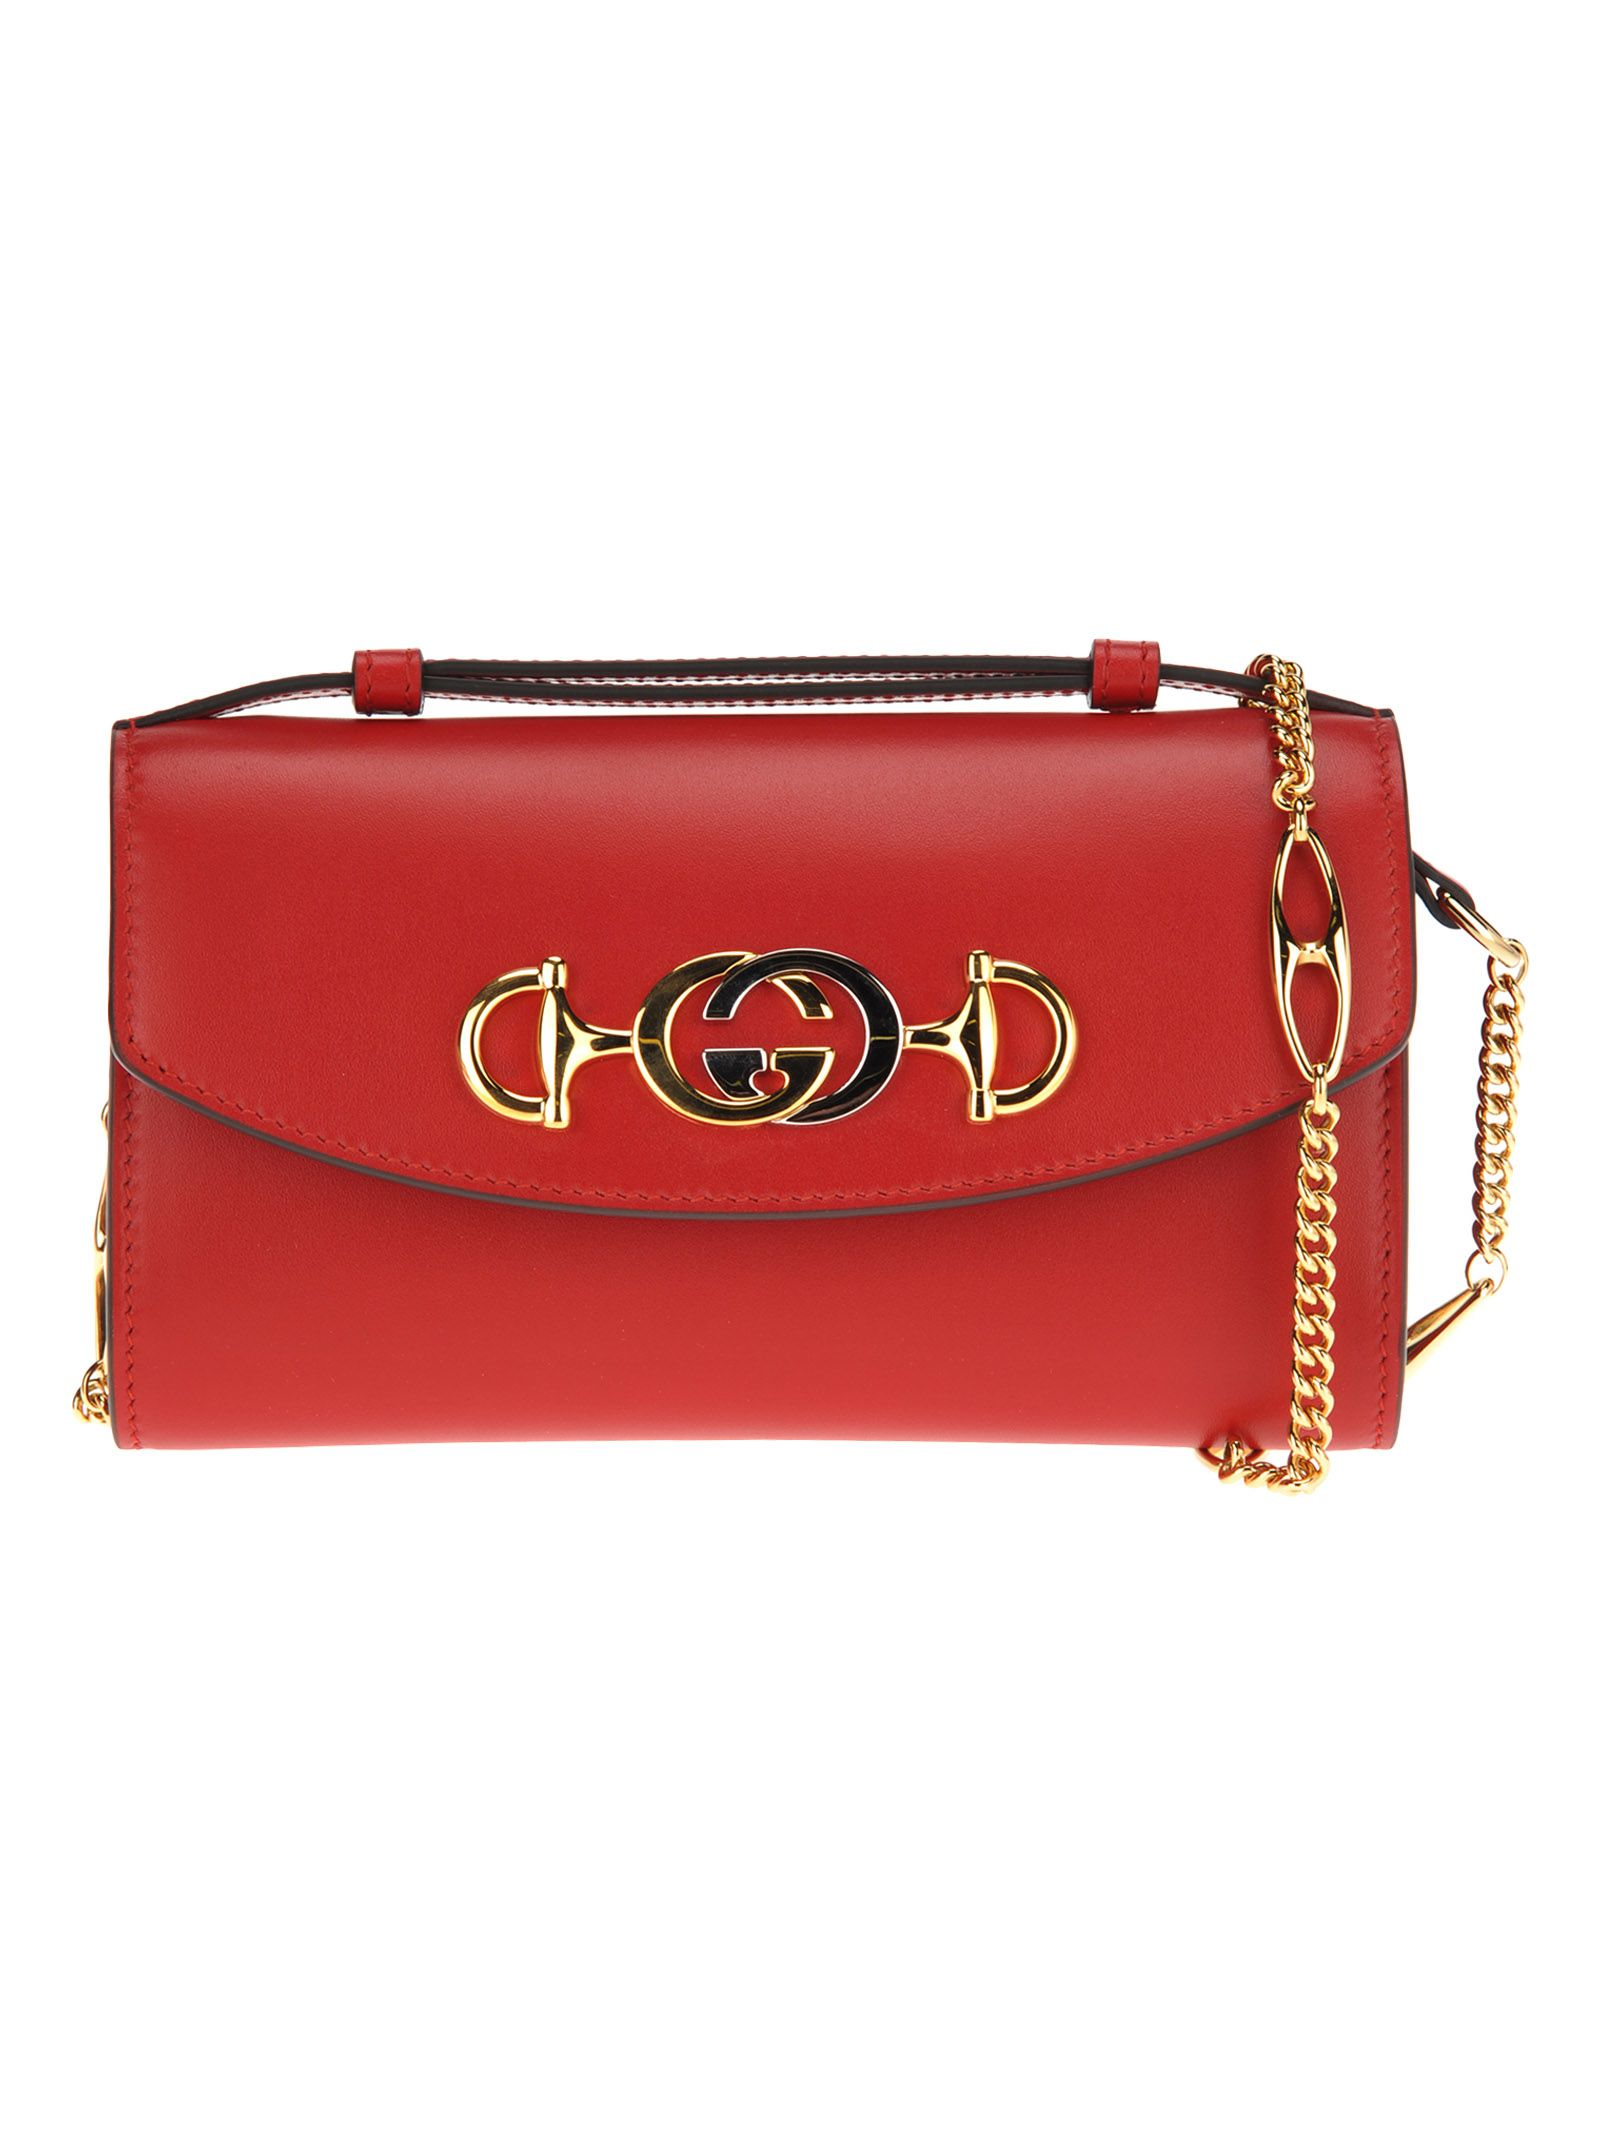 1d242c583d23 Gucci Gucci Gucci Zumi Smooth Leather Mini Bag - RED - 10926511 ...